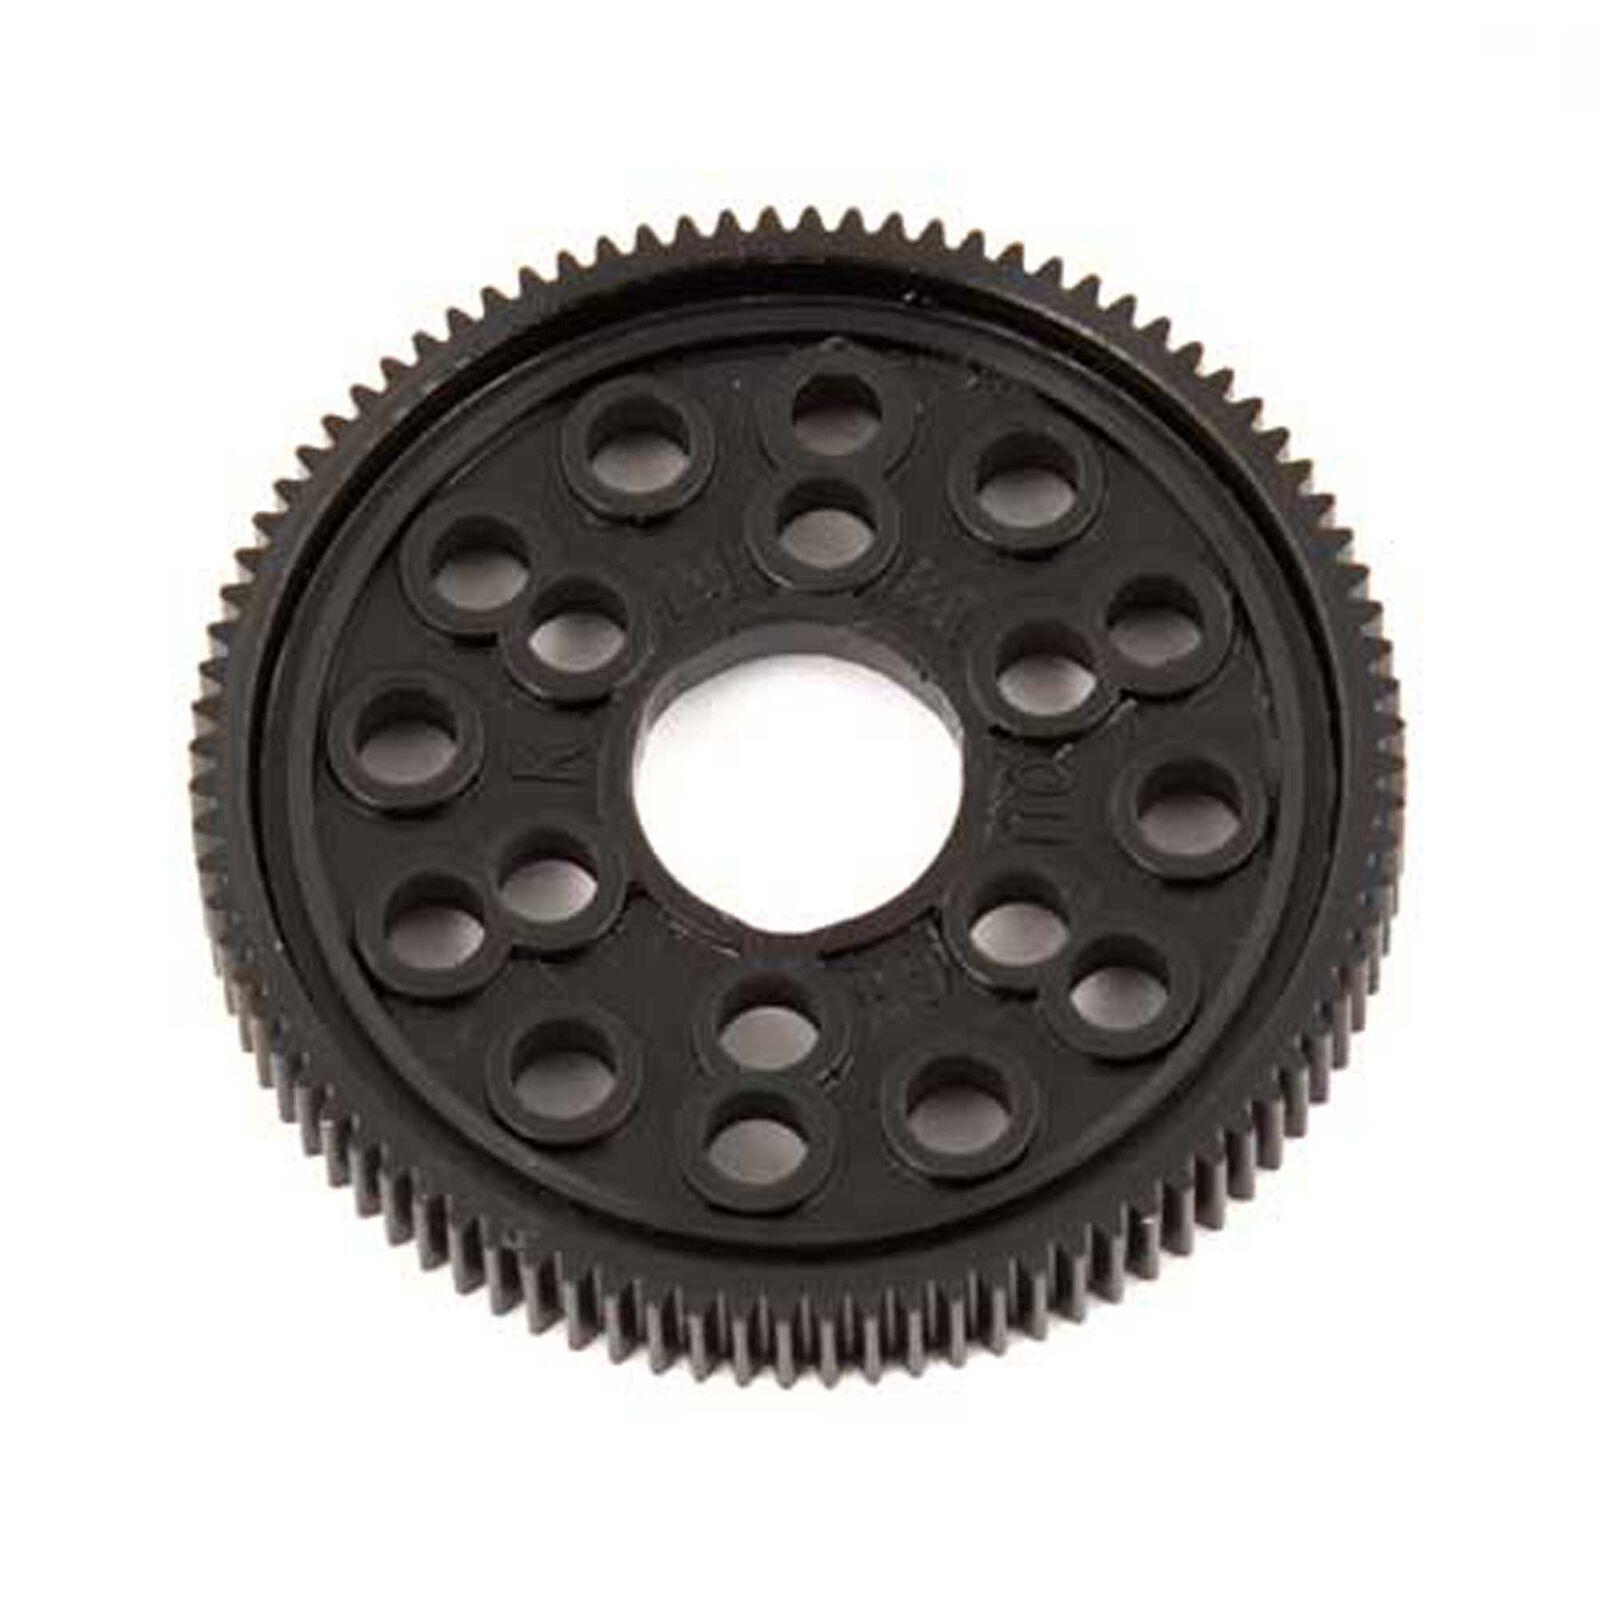 Spur Gear, 64 Pitch, 88T